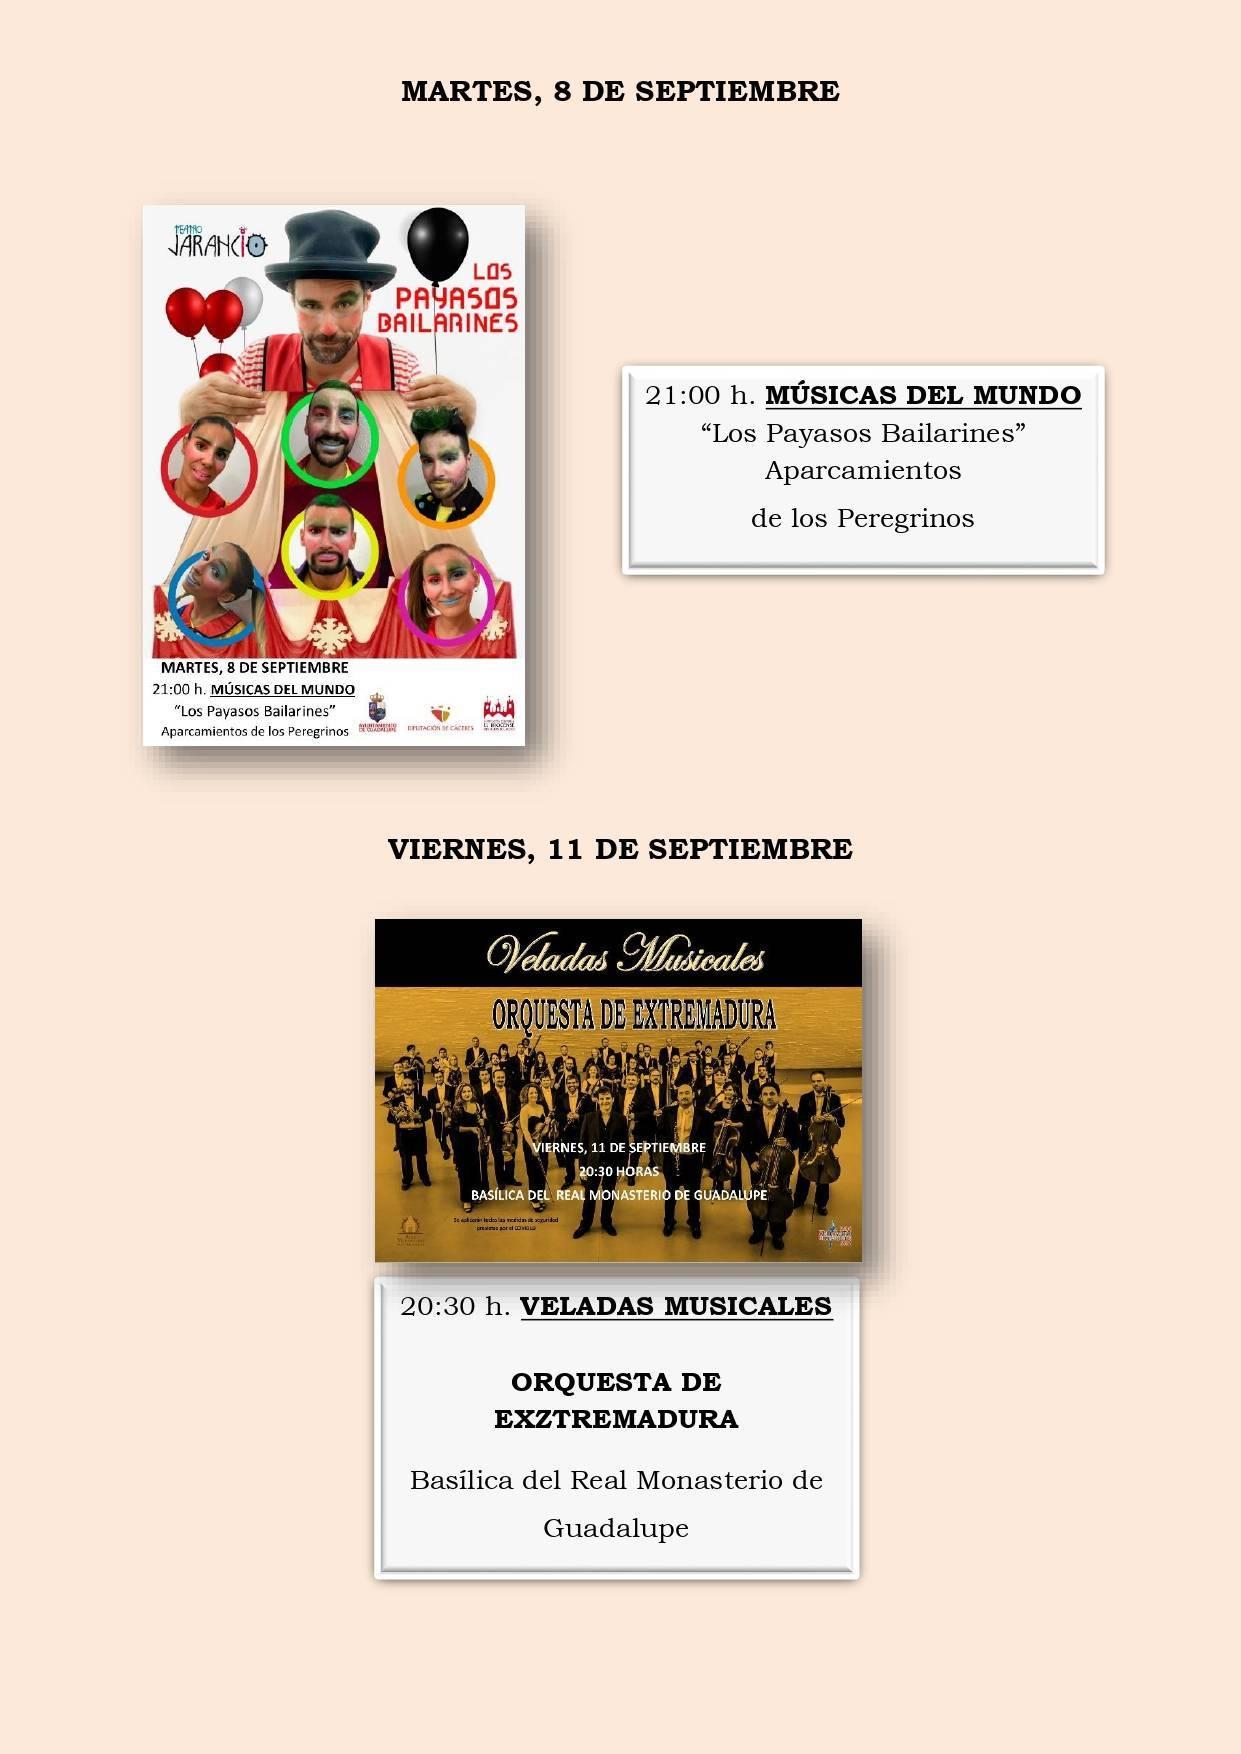 Programa cultural de verano 2020 - Guadalupe (Cáceres) 9